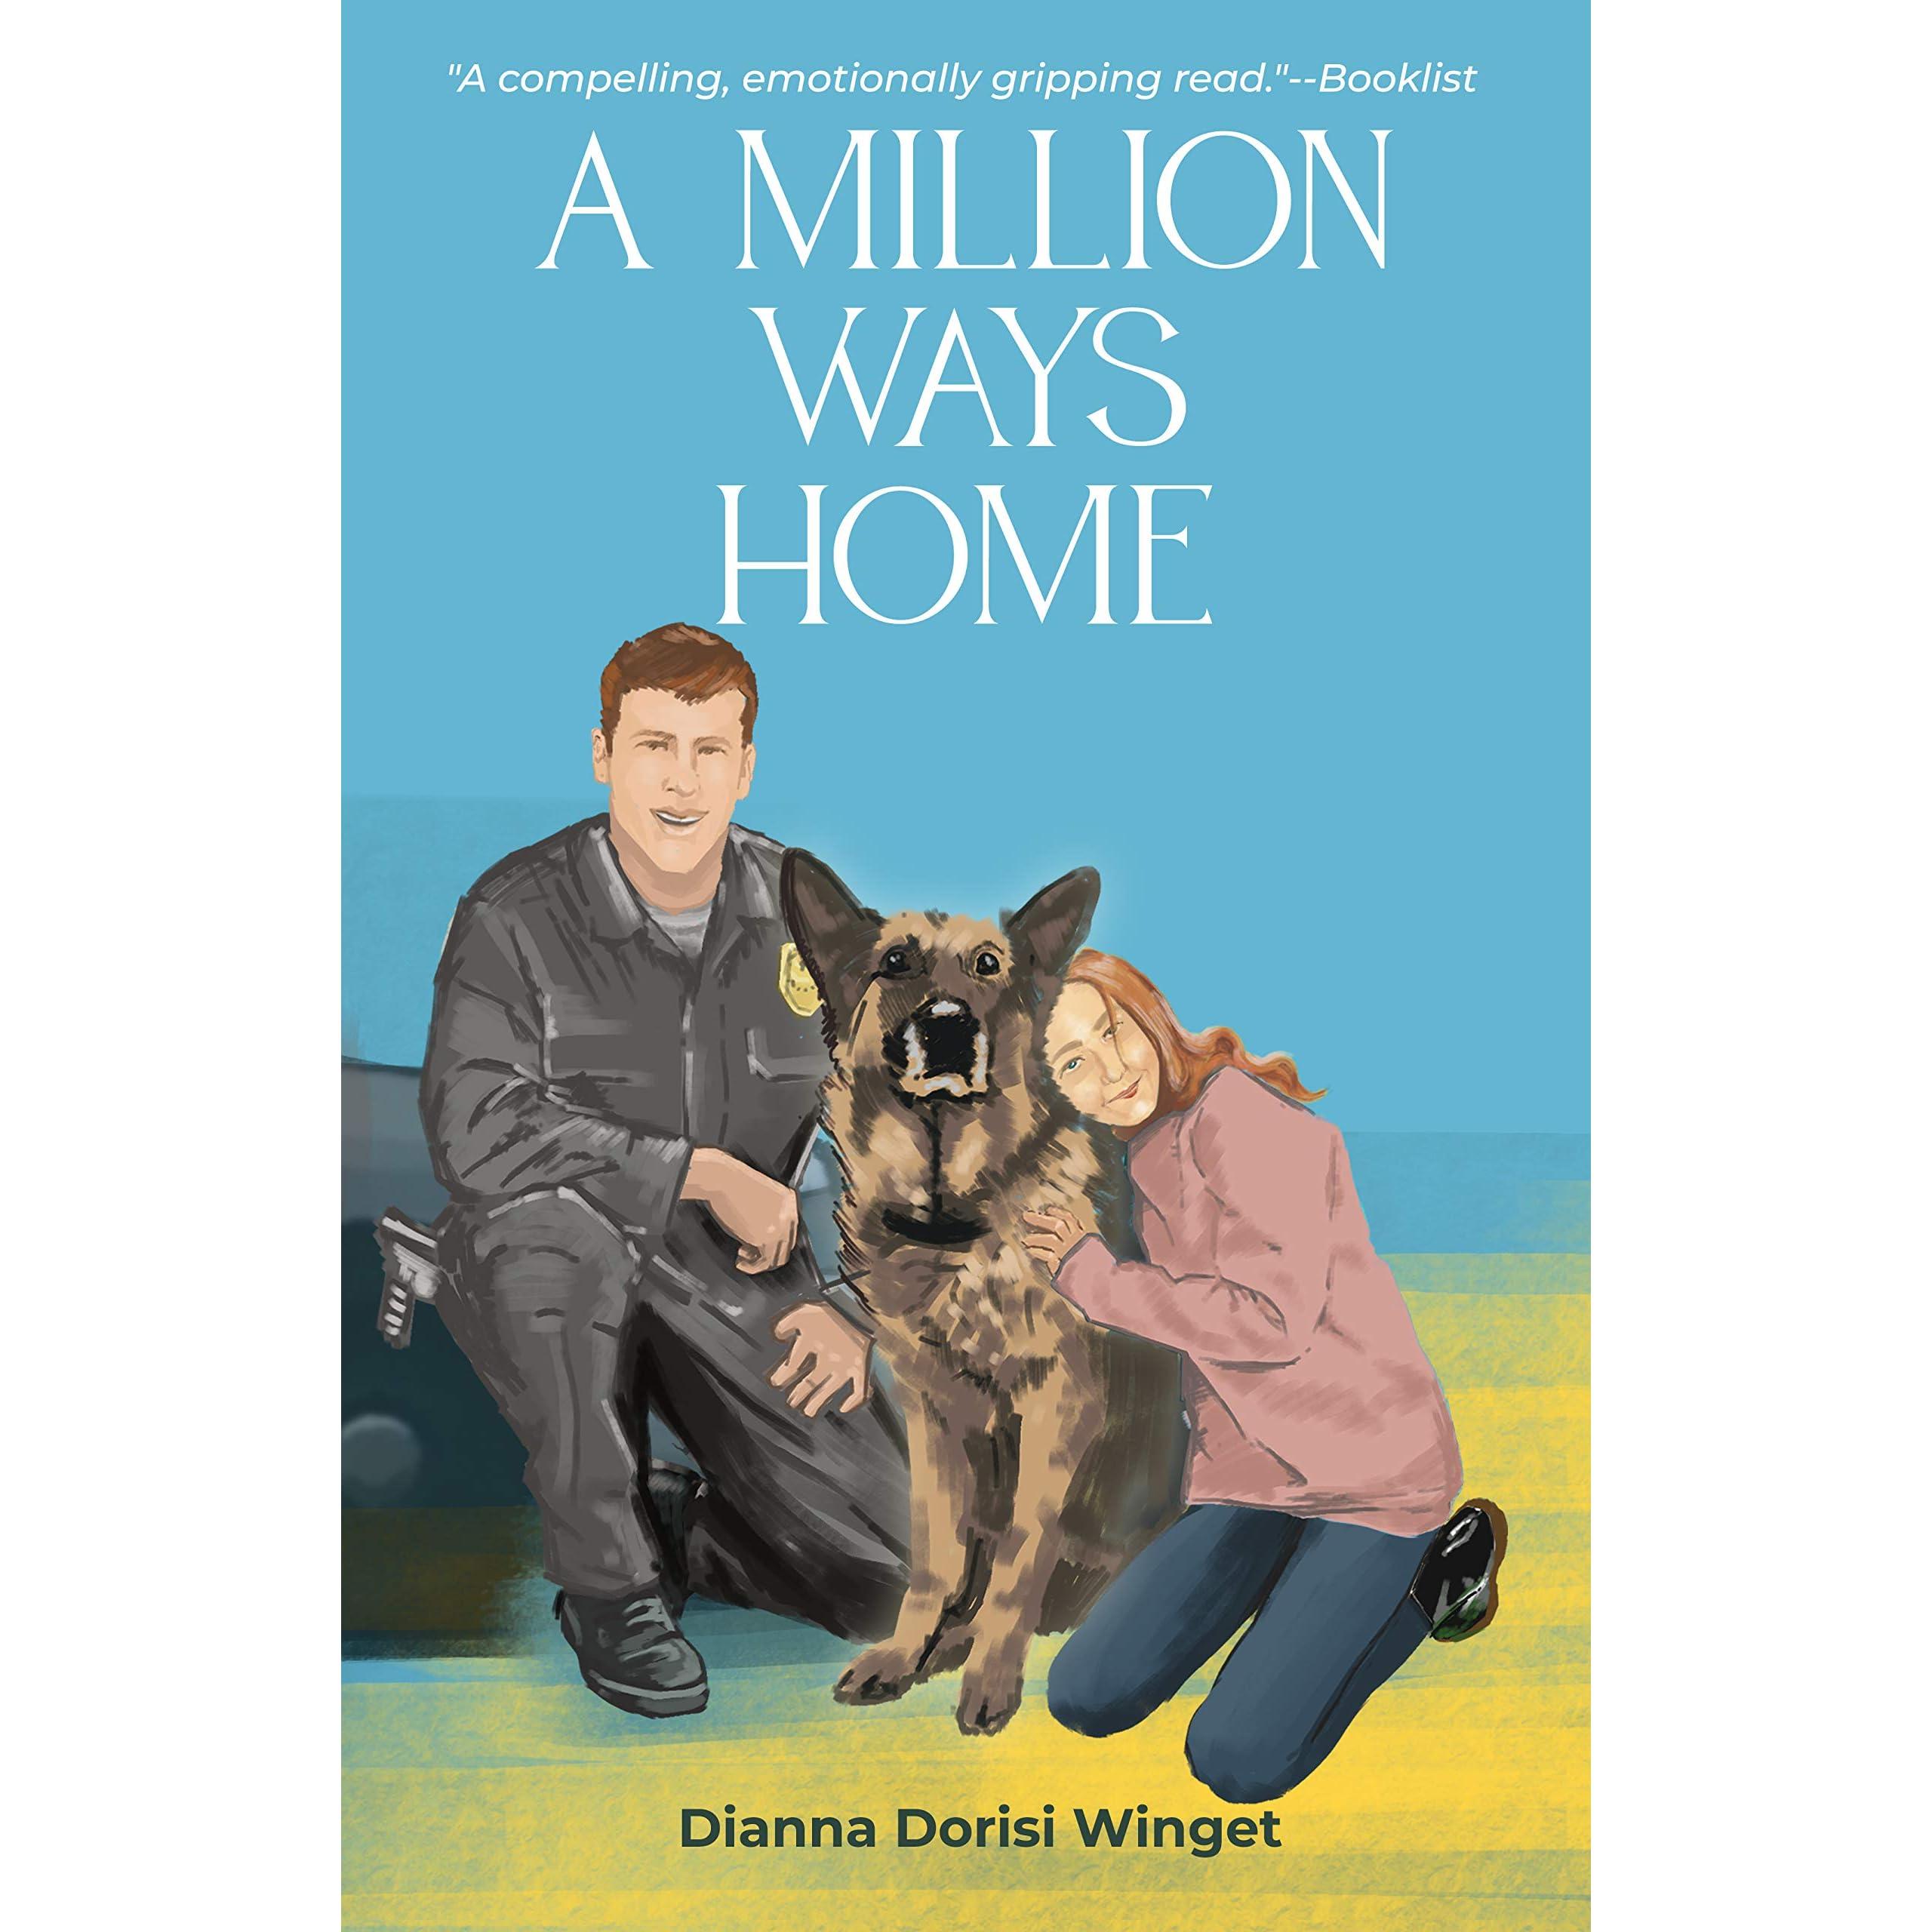 A Million Ways Home By Dianna Dorisi Winget